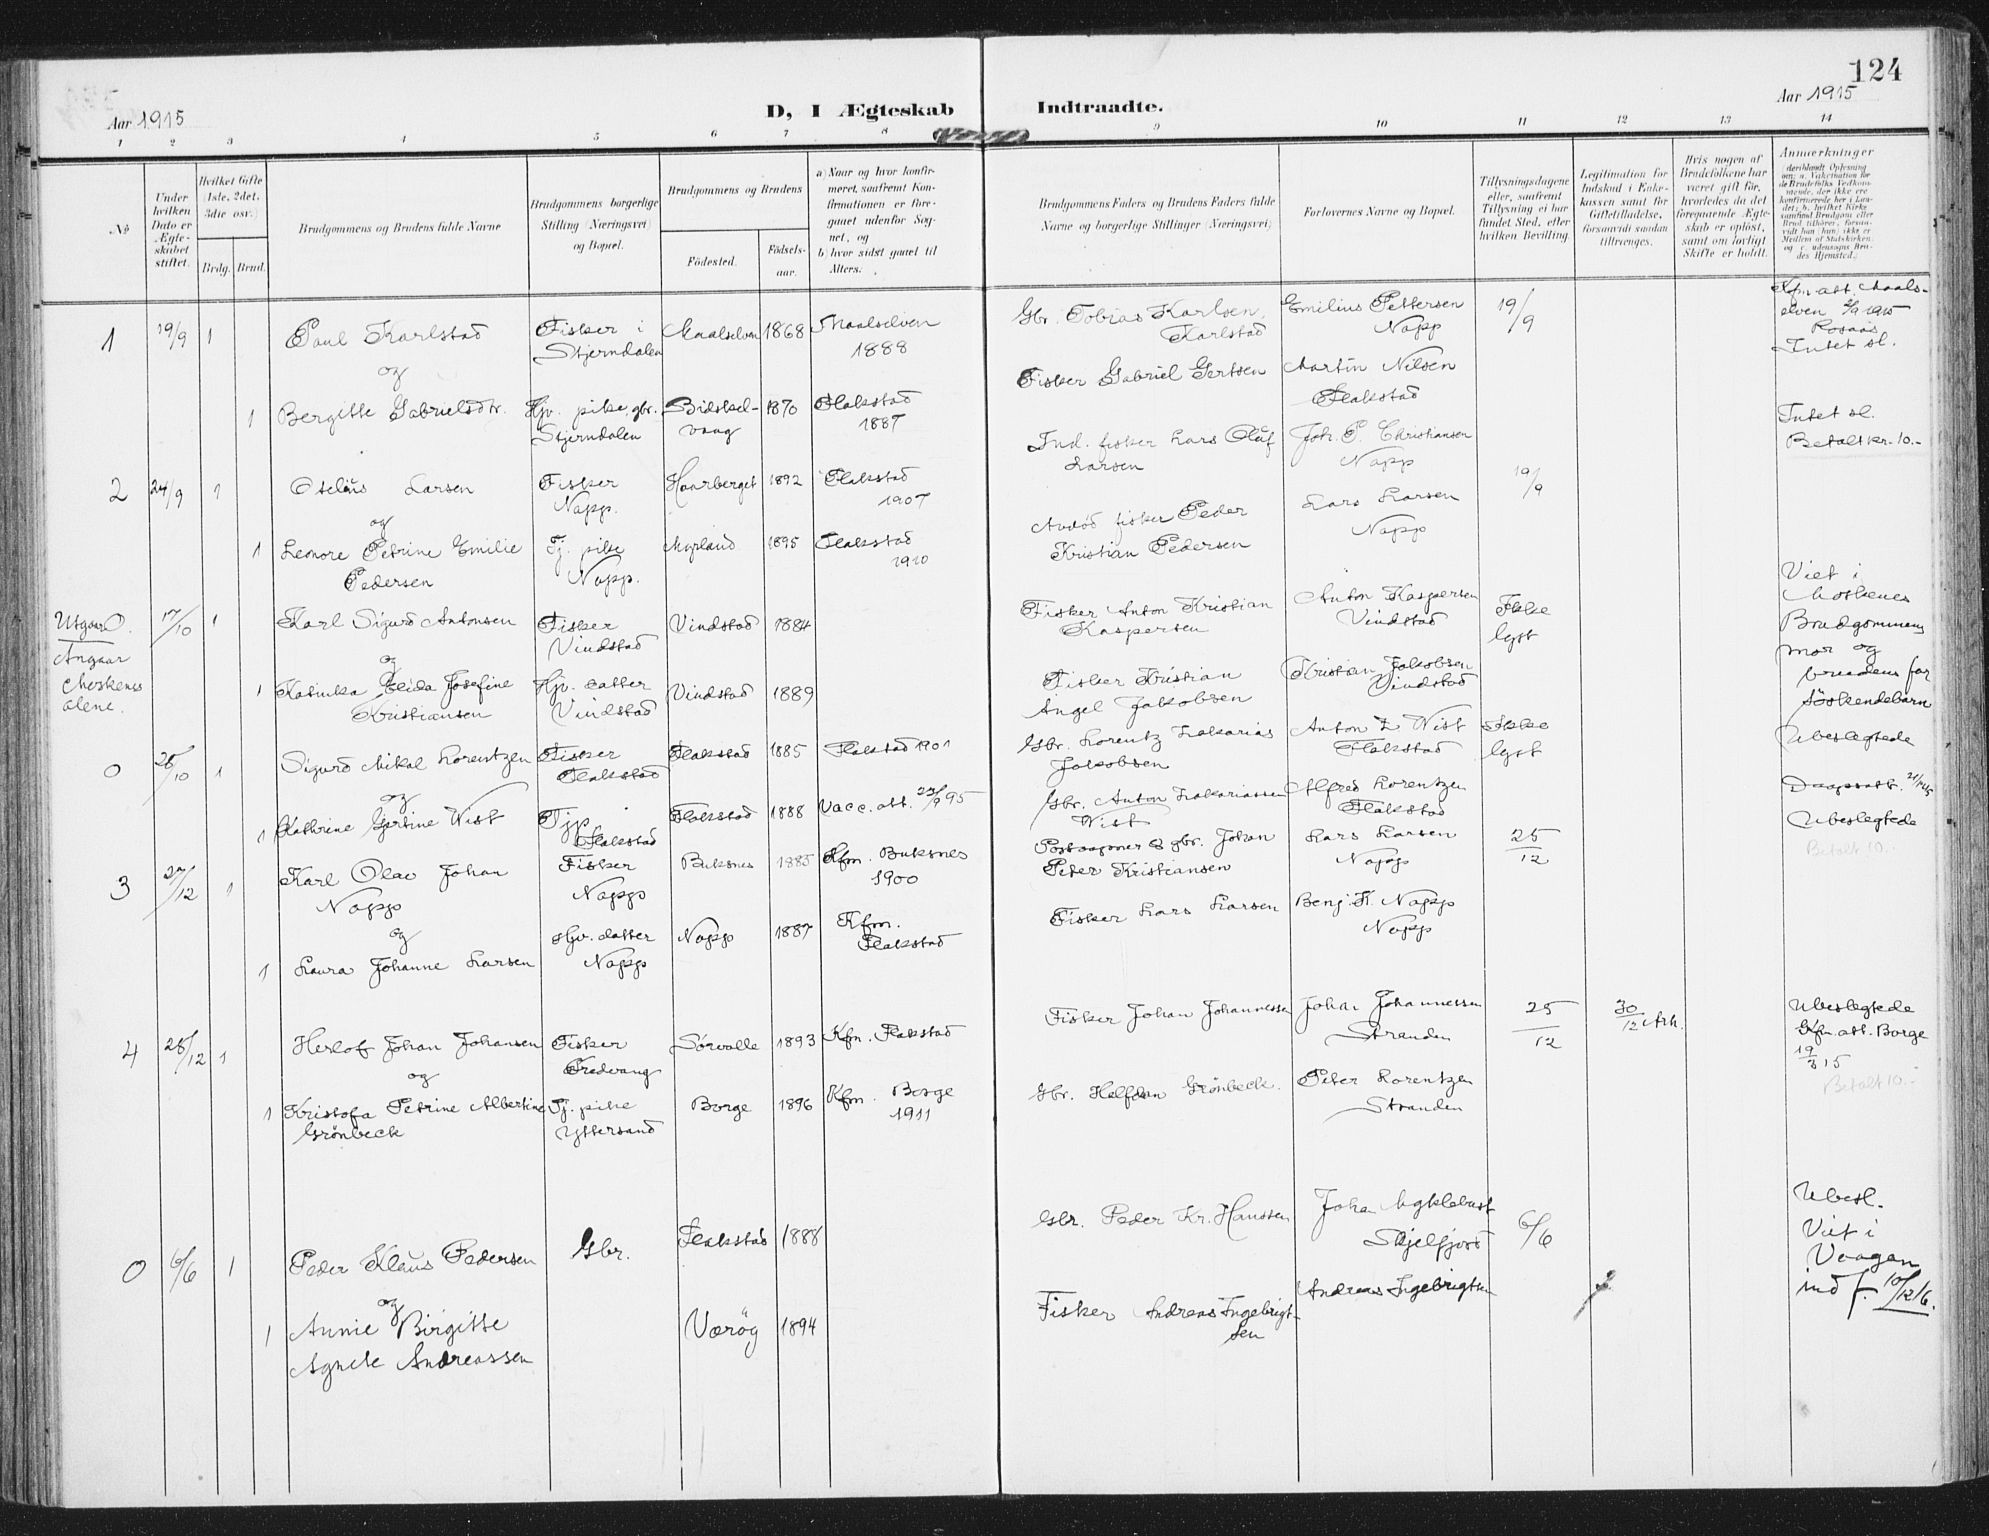 SAT, Ministerialprotokoller, klokkerbøker og fødselsregistre - Nordland, 885/L1206: Ministerialbok nr. 885A07, 1905-1915, s. 124